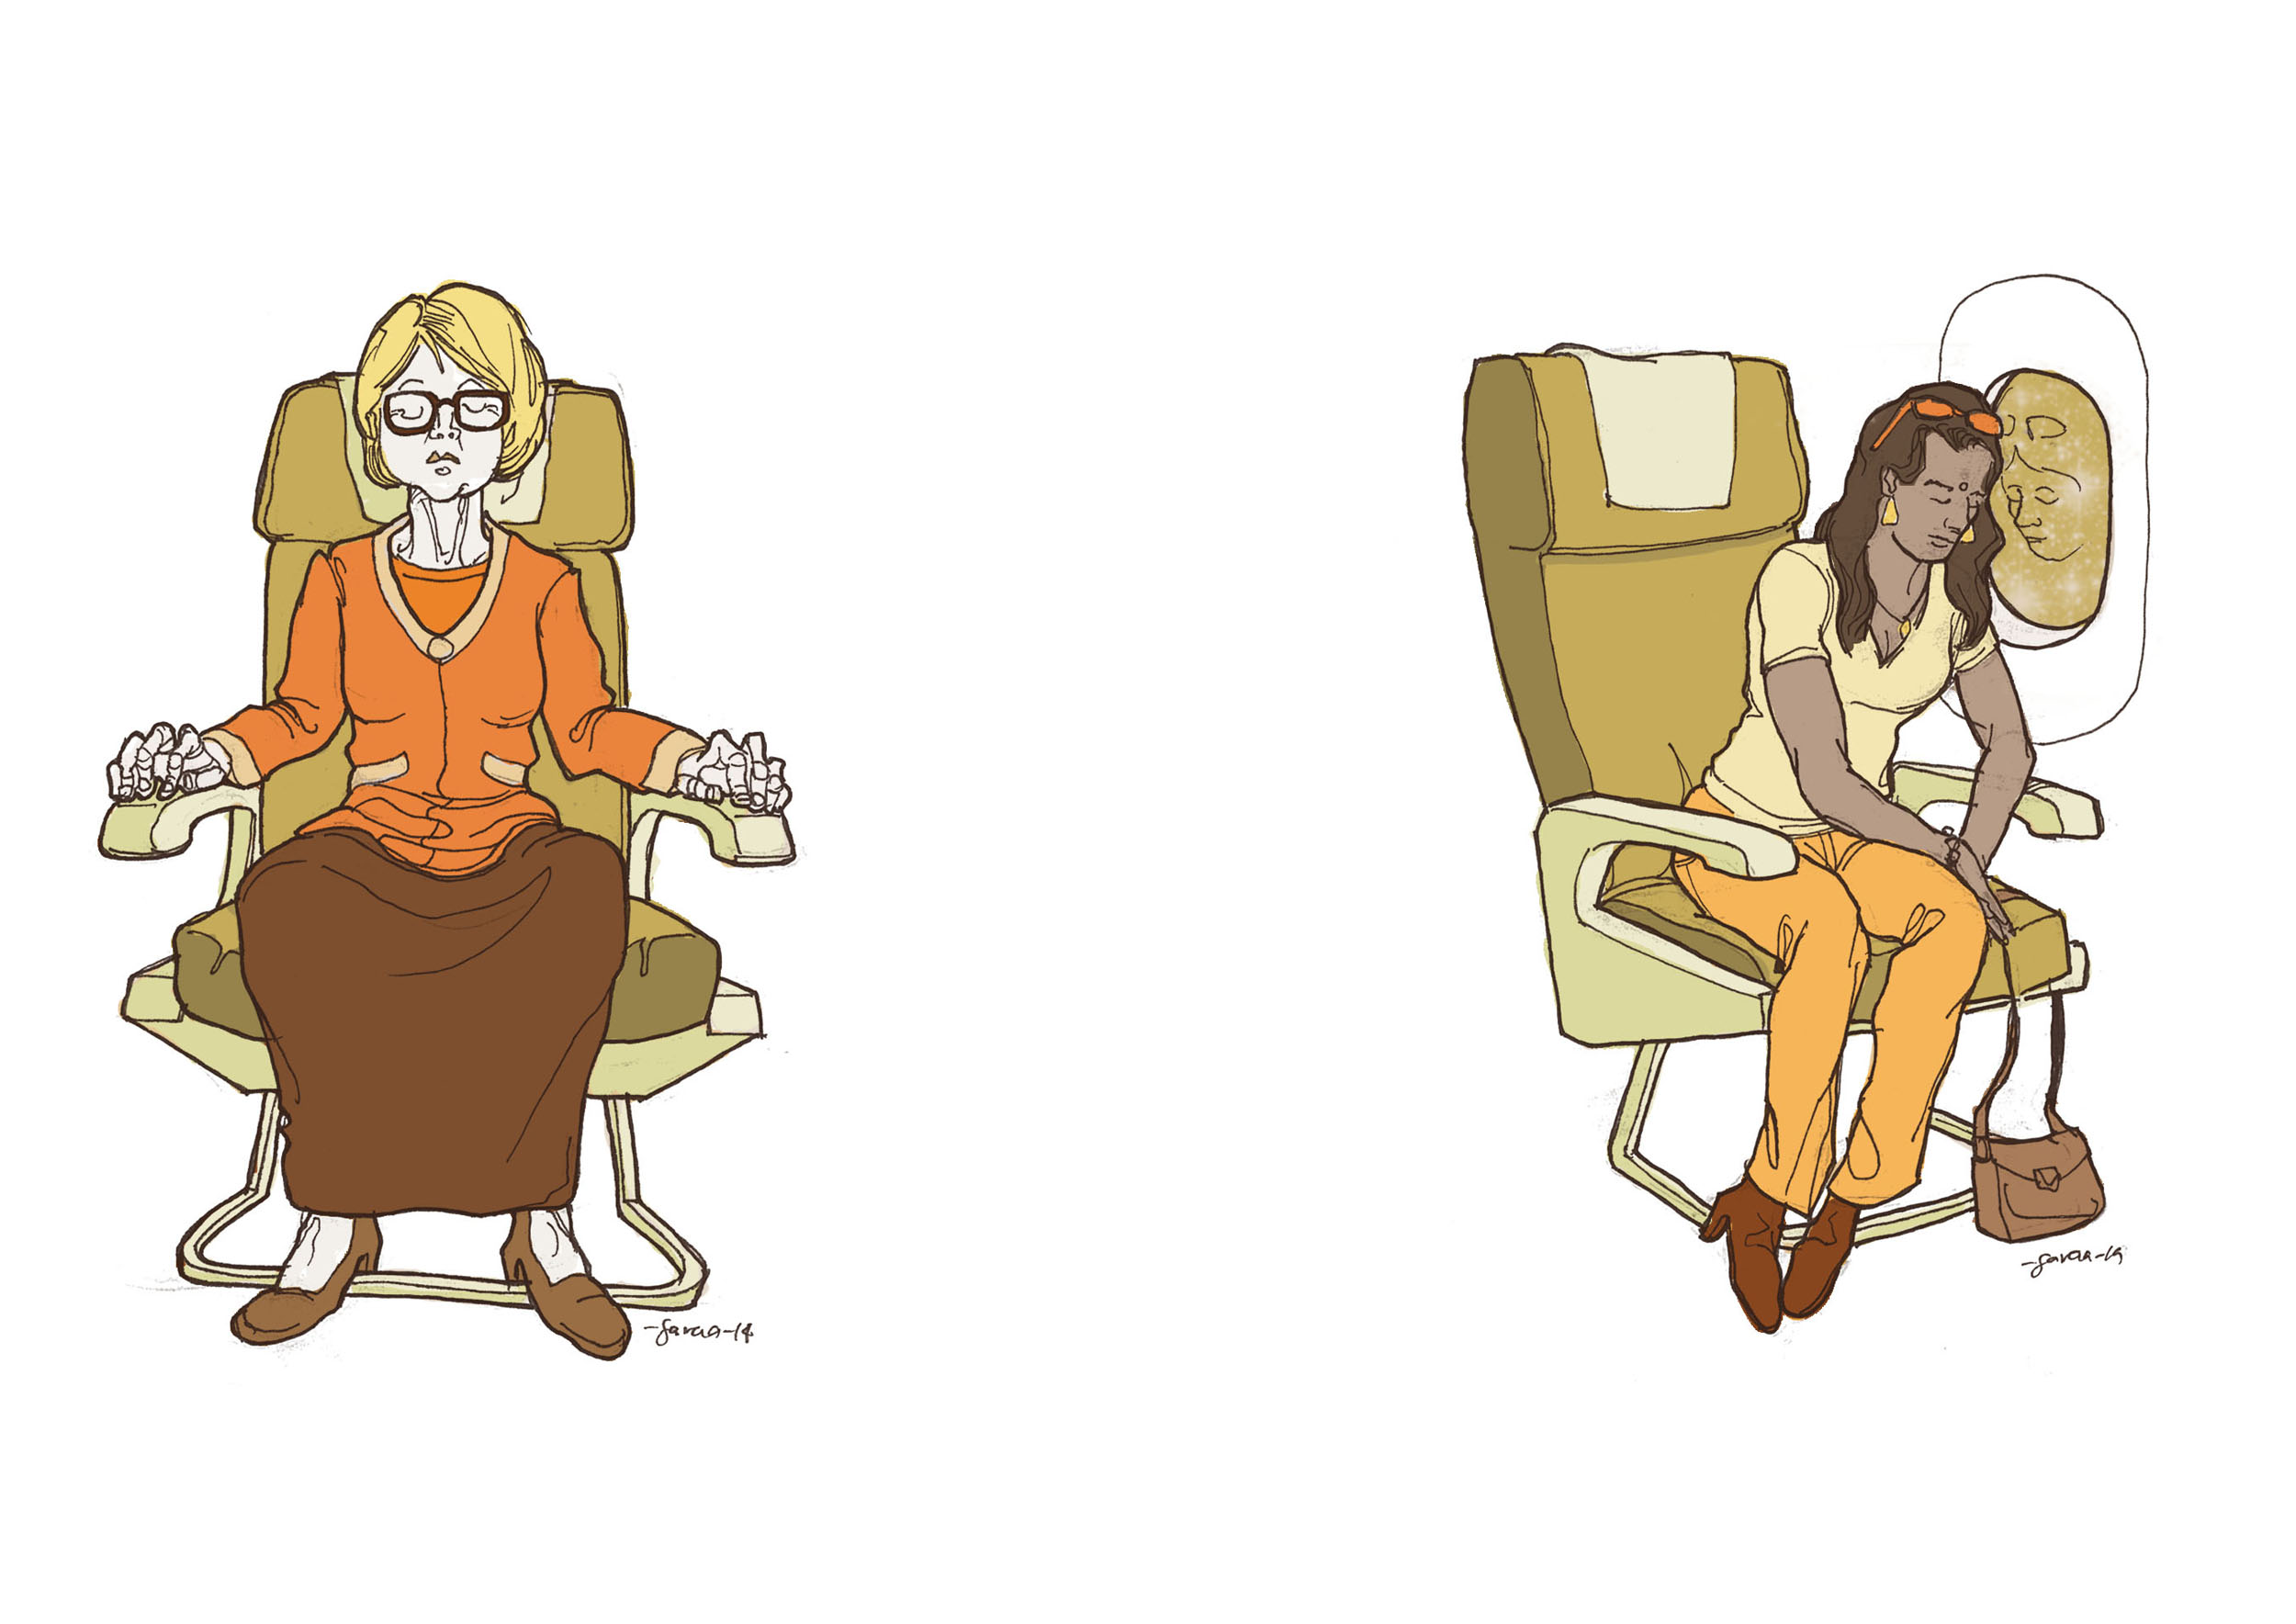 daniel-garcia-art-illustration-sleep-on-plane-national-geographic-traveler-02